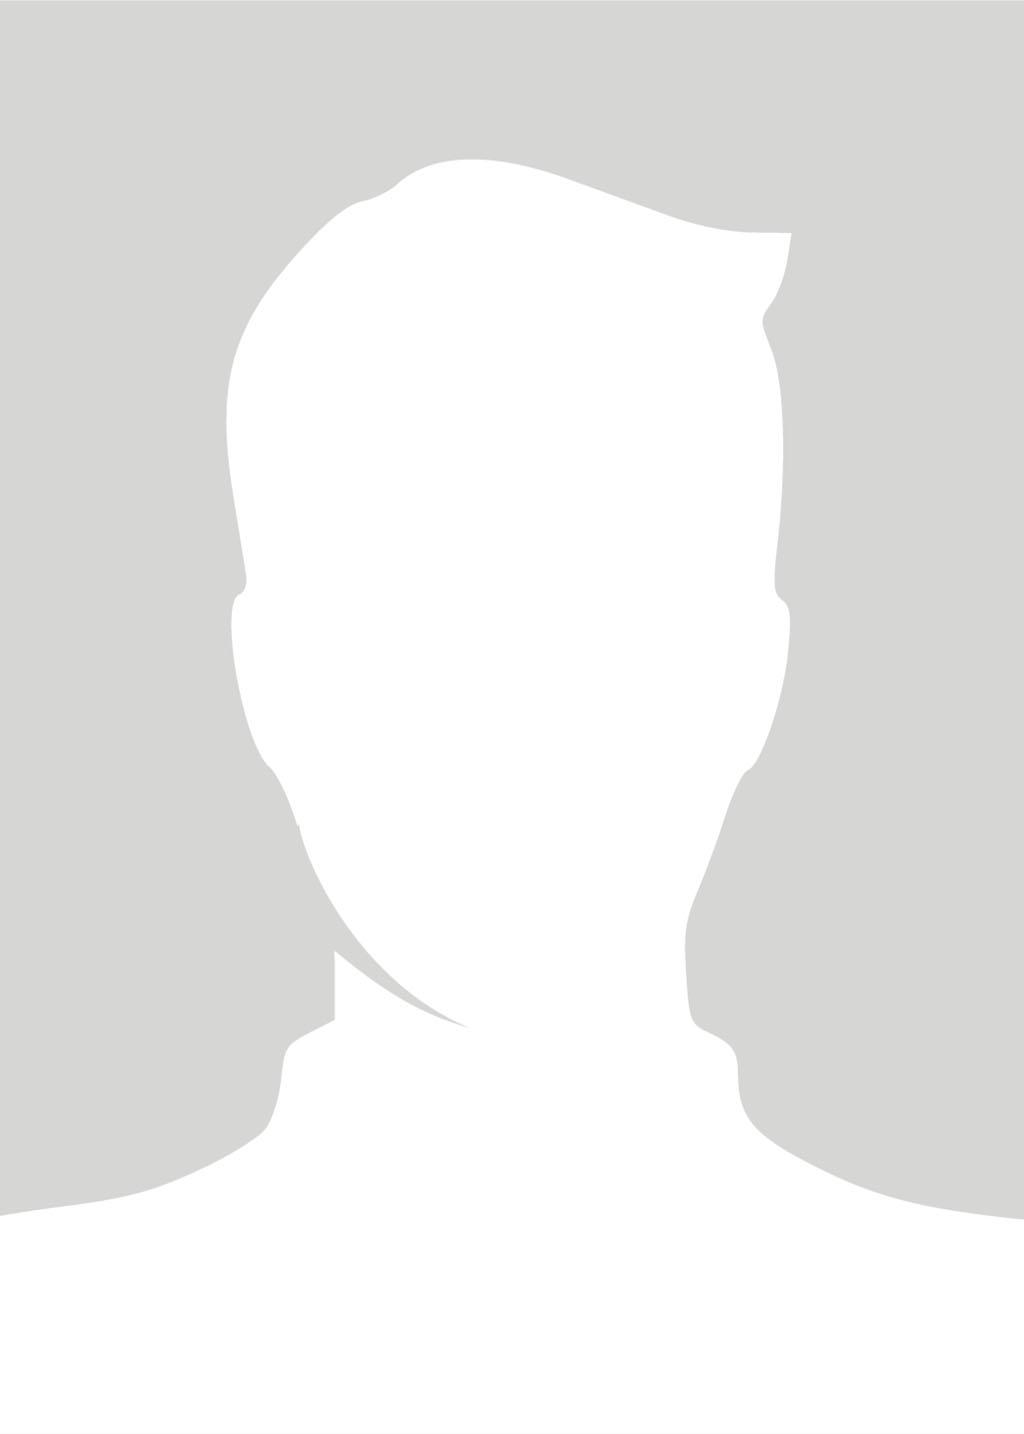 Blank-profile-image